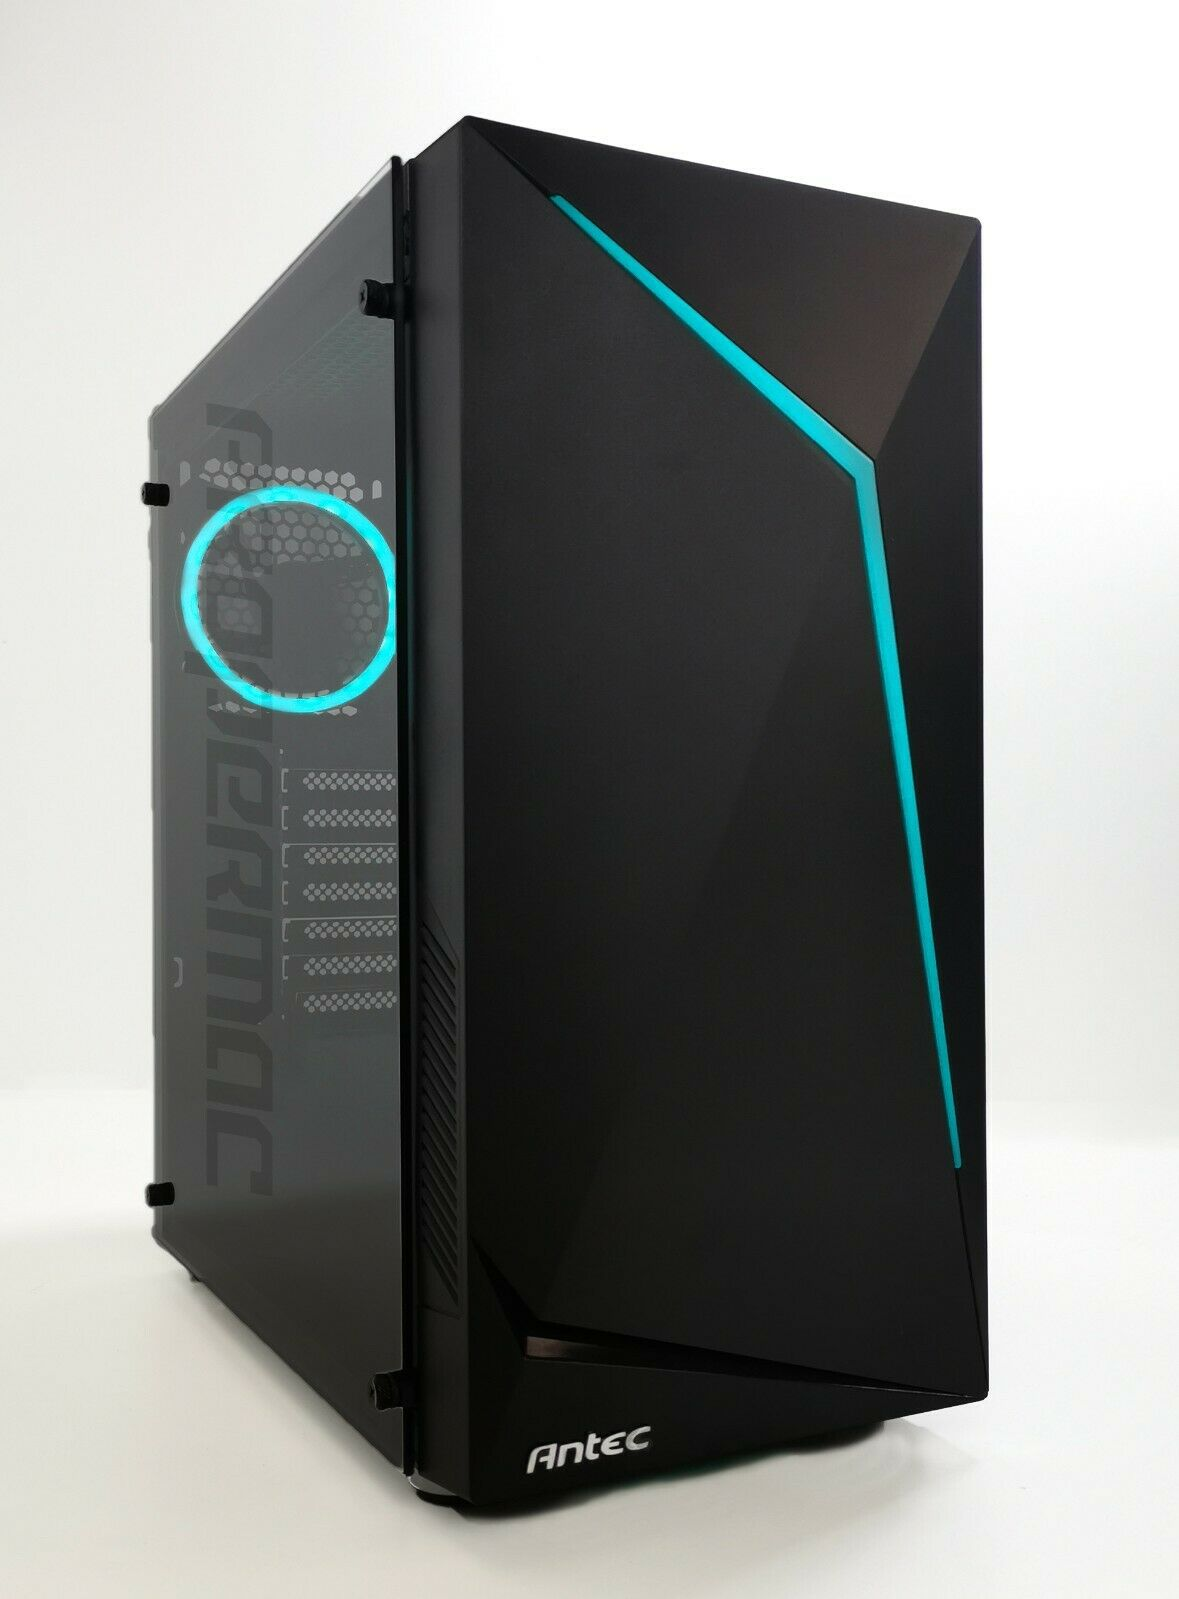 Computer Games - FAST GAMING PC COMPUTER Quad i5 16 Ram 480GB SSD 6GB GDDR6 GTX 1660Ti Windows 10